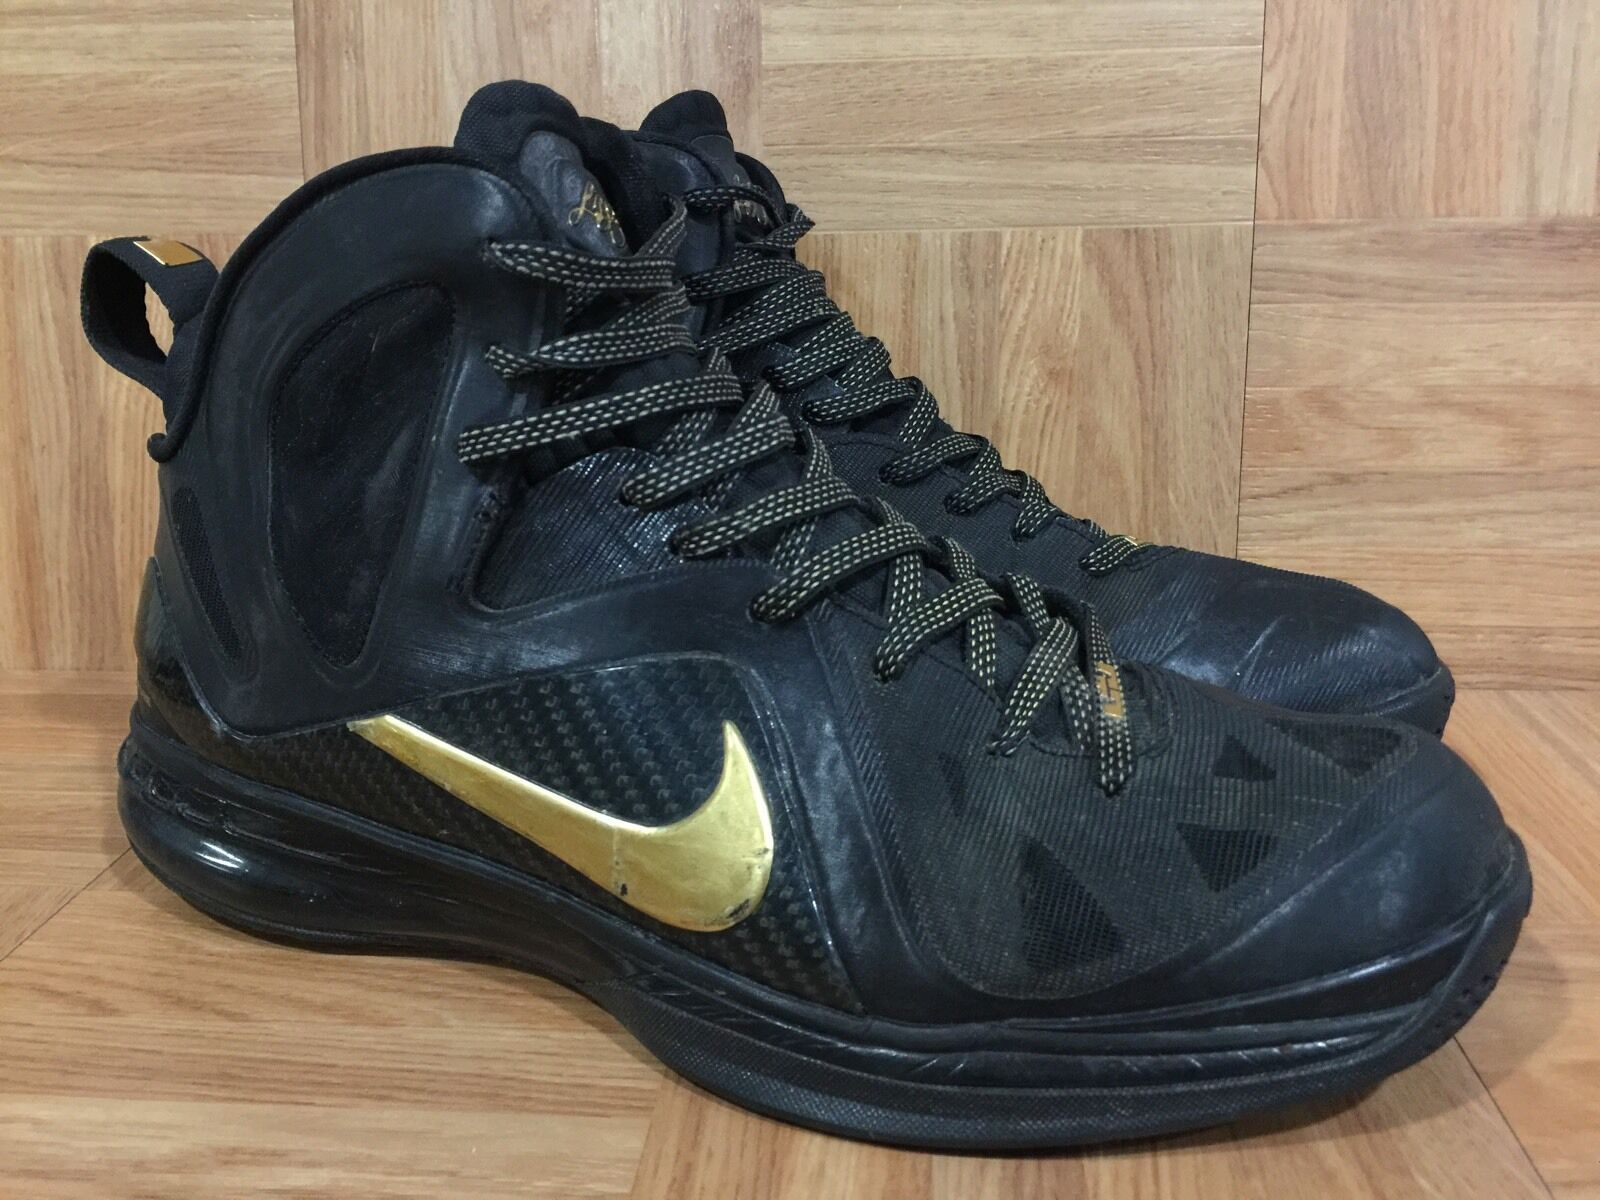 RARE  Nike LeBron PS Elite Away Black Metallic Gold Sz 11.5 516958-002 Blackout